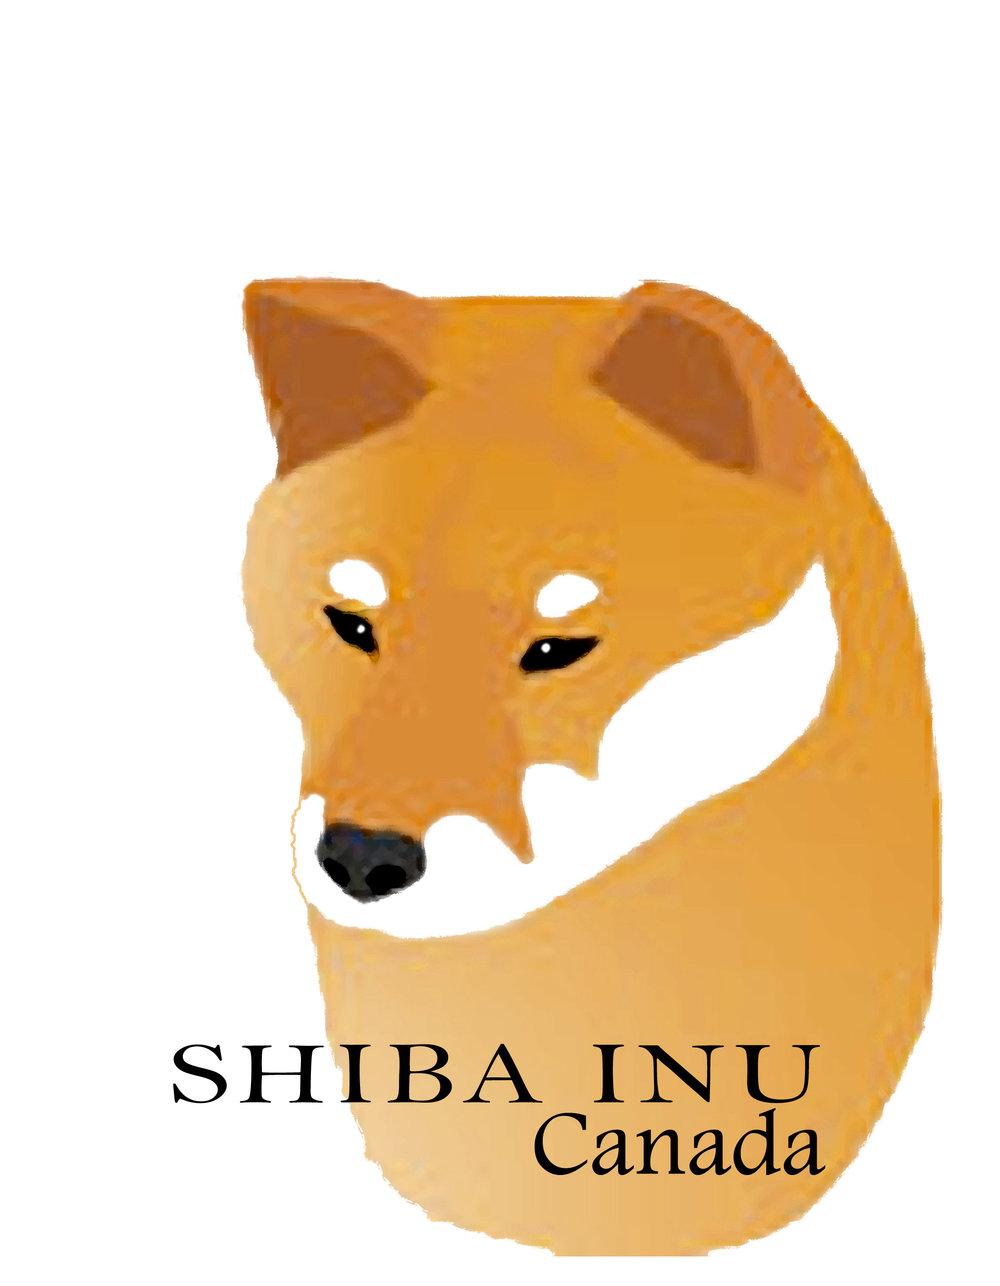 Shiba.jpg